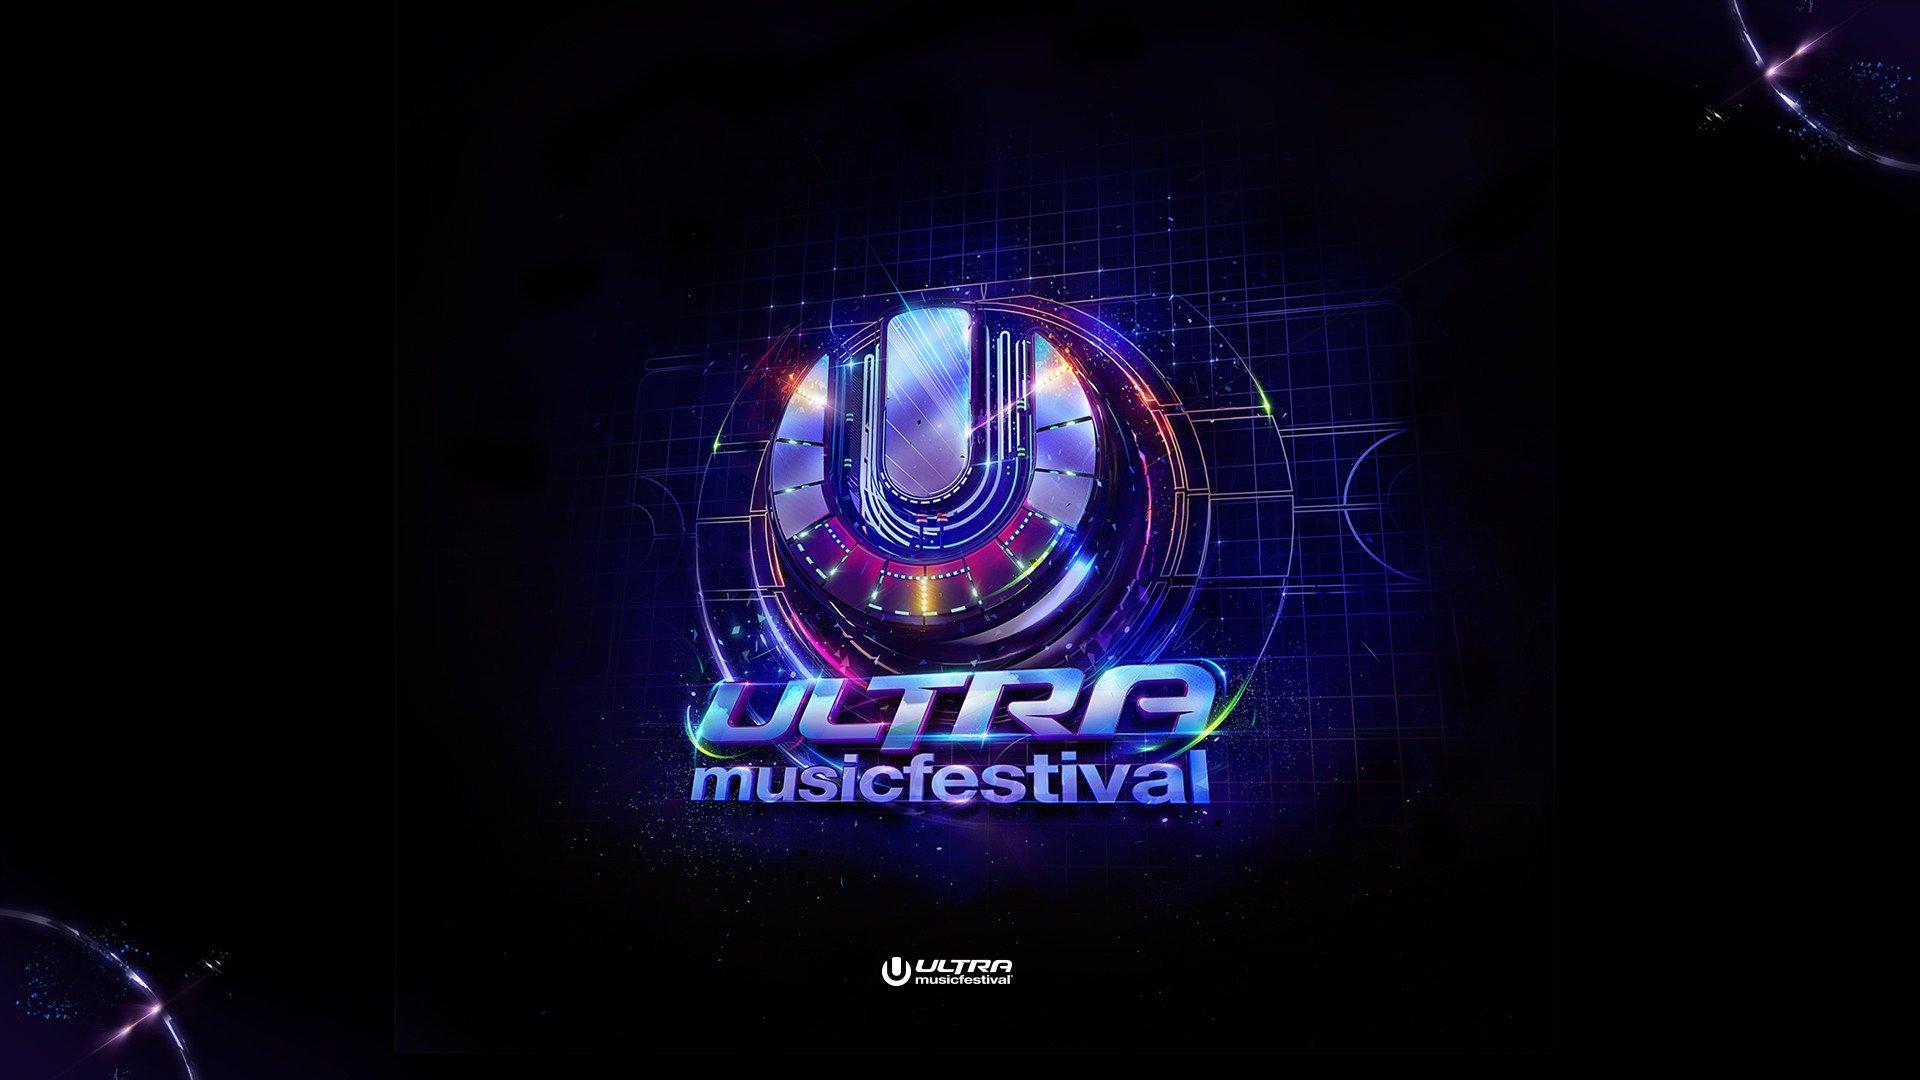 Download Ultra Music Festival Wallpaper Hd Gallery: Ultra Music Festival HD Wallpaper